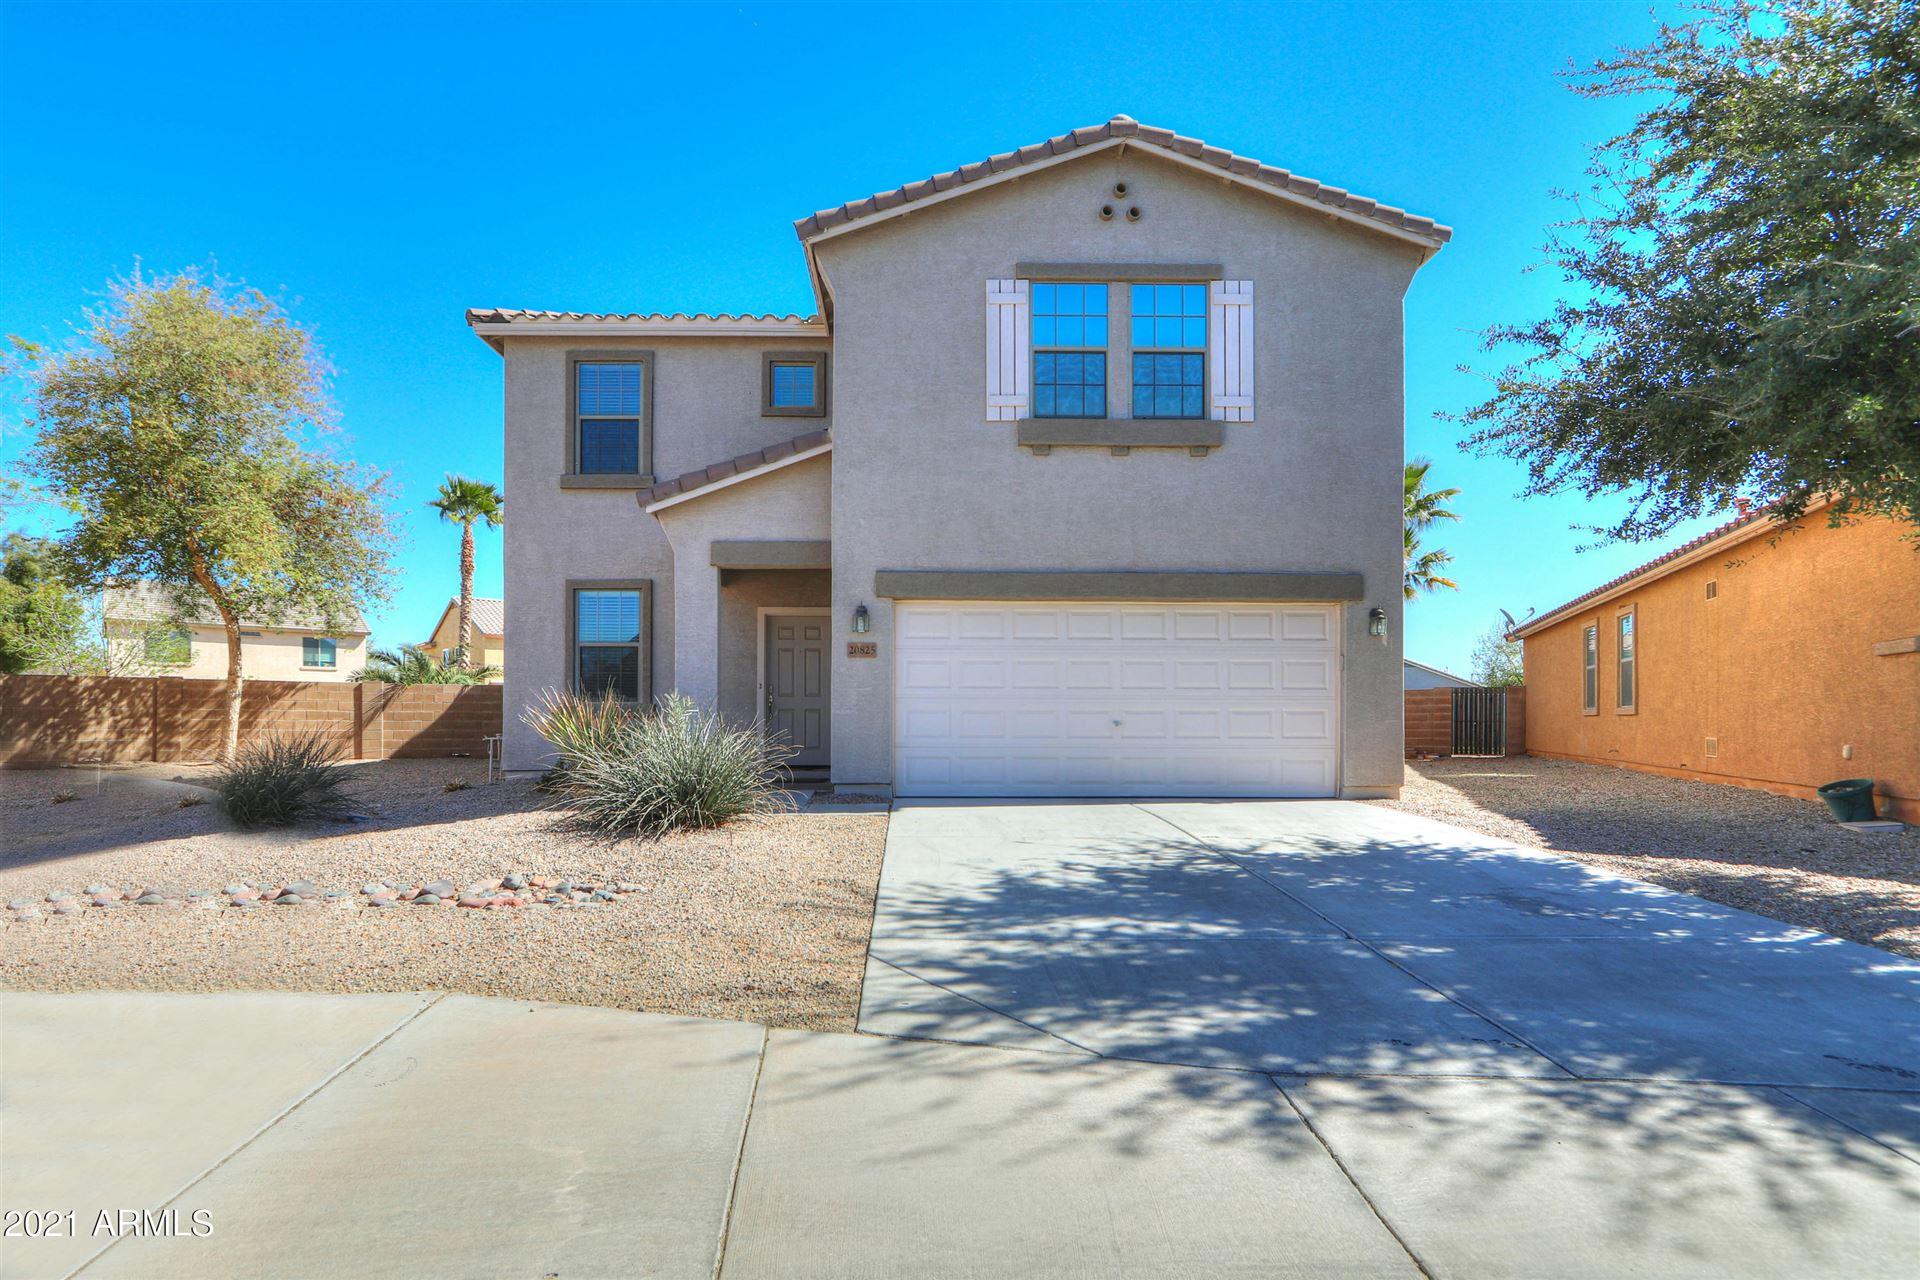 Photo of 20825 N MARQUEZ Drive, Maricopa, AZ 85138 (MLS # 6201607)